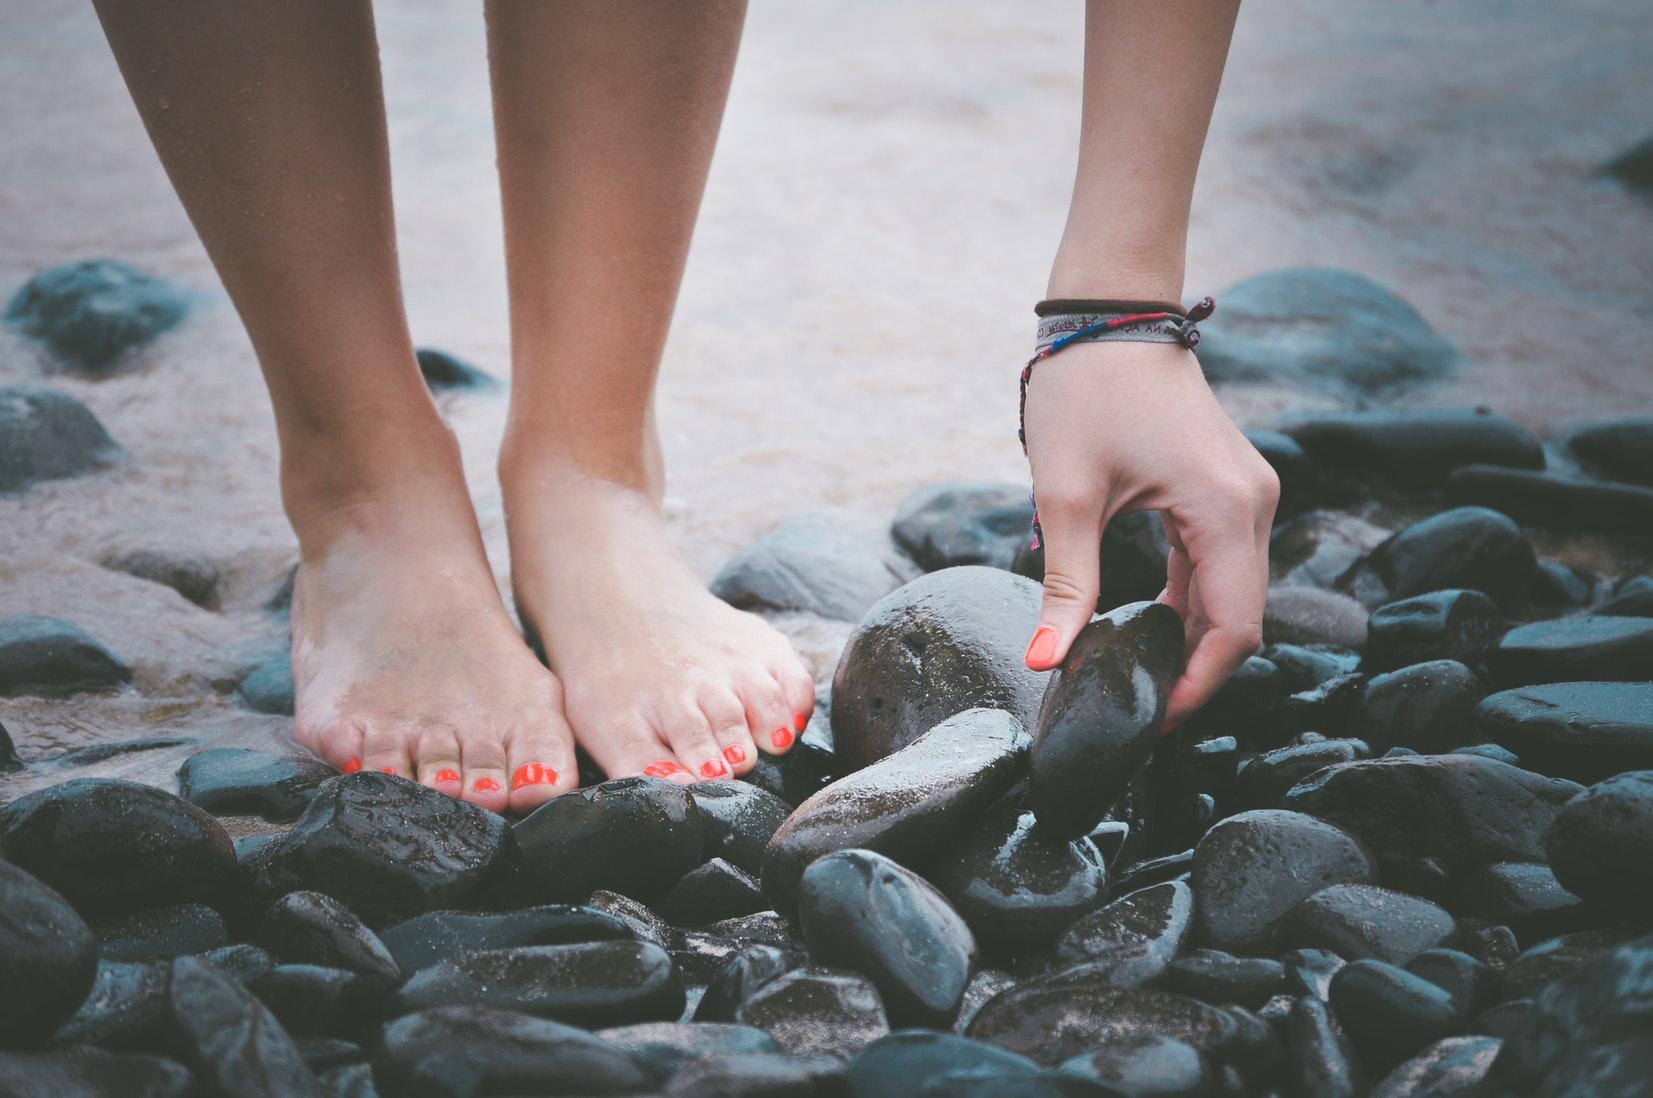 paznokcie - dłonie i stopy